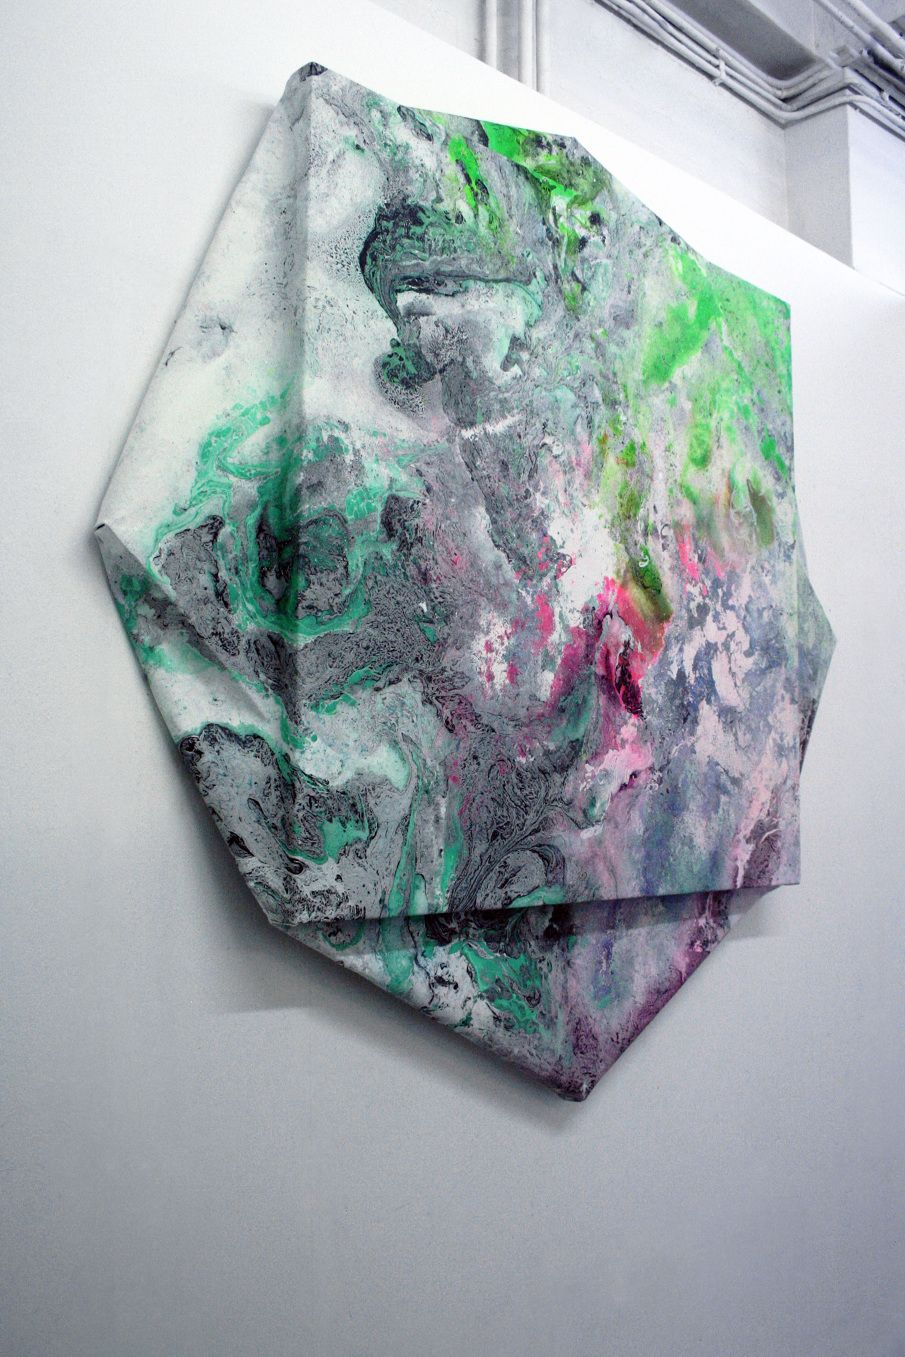 Valentin Dommanget DIGITAL STRETCHER STUDIES II acrylic spray pigments, chemical solutions on canvas 2014  http://vdommanget.com